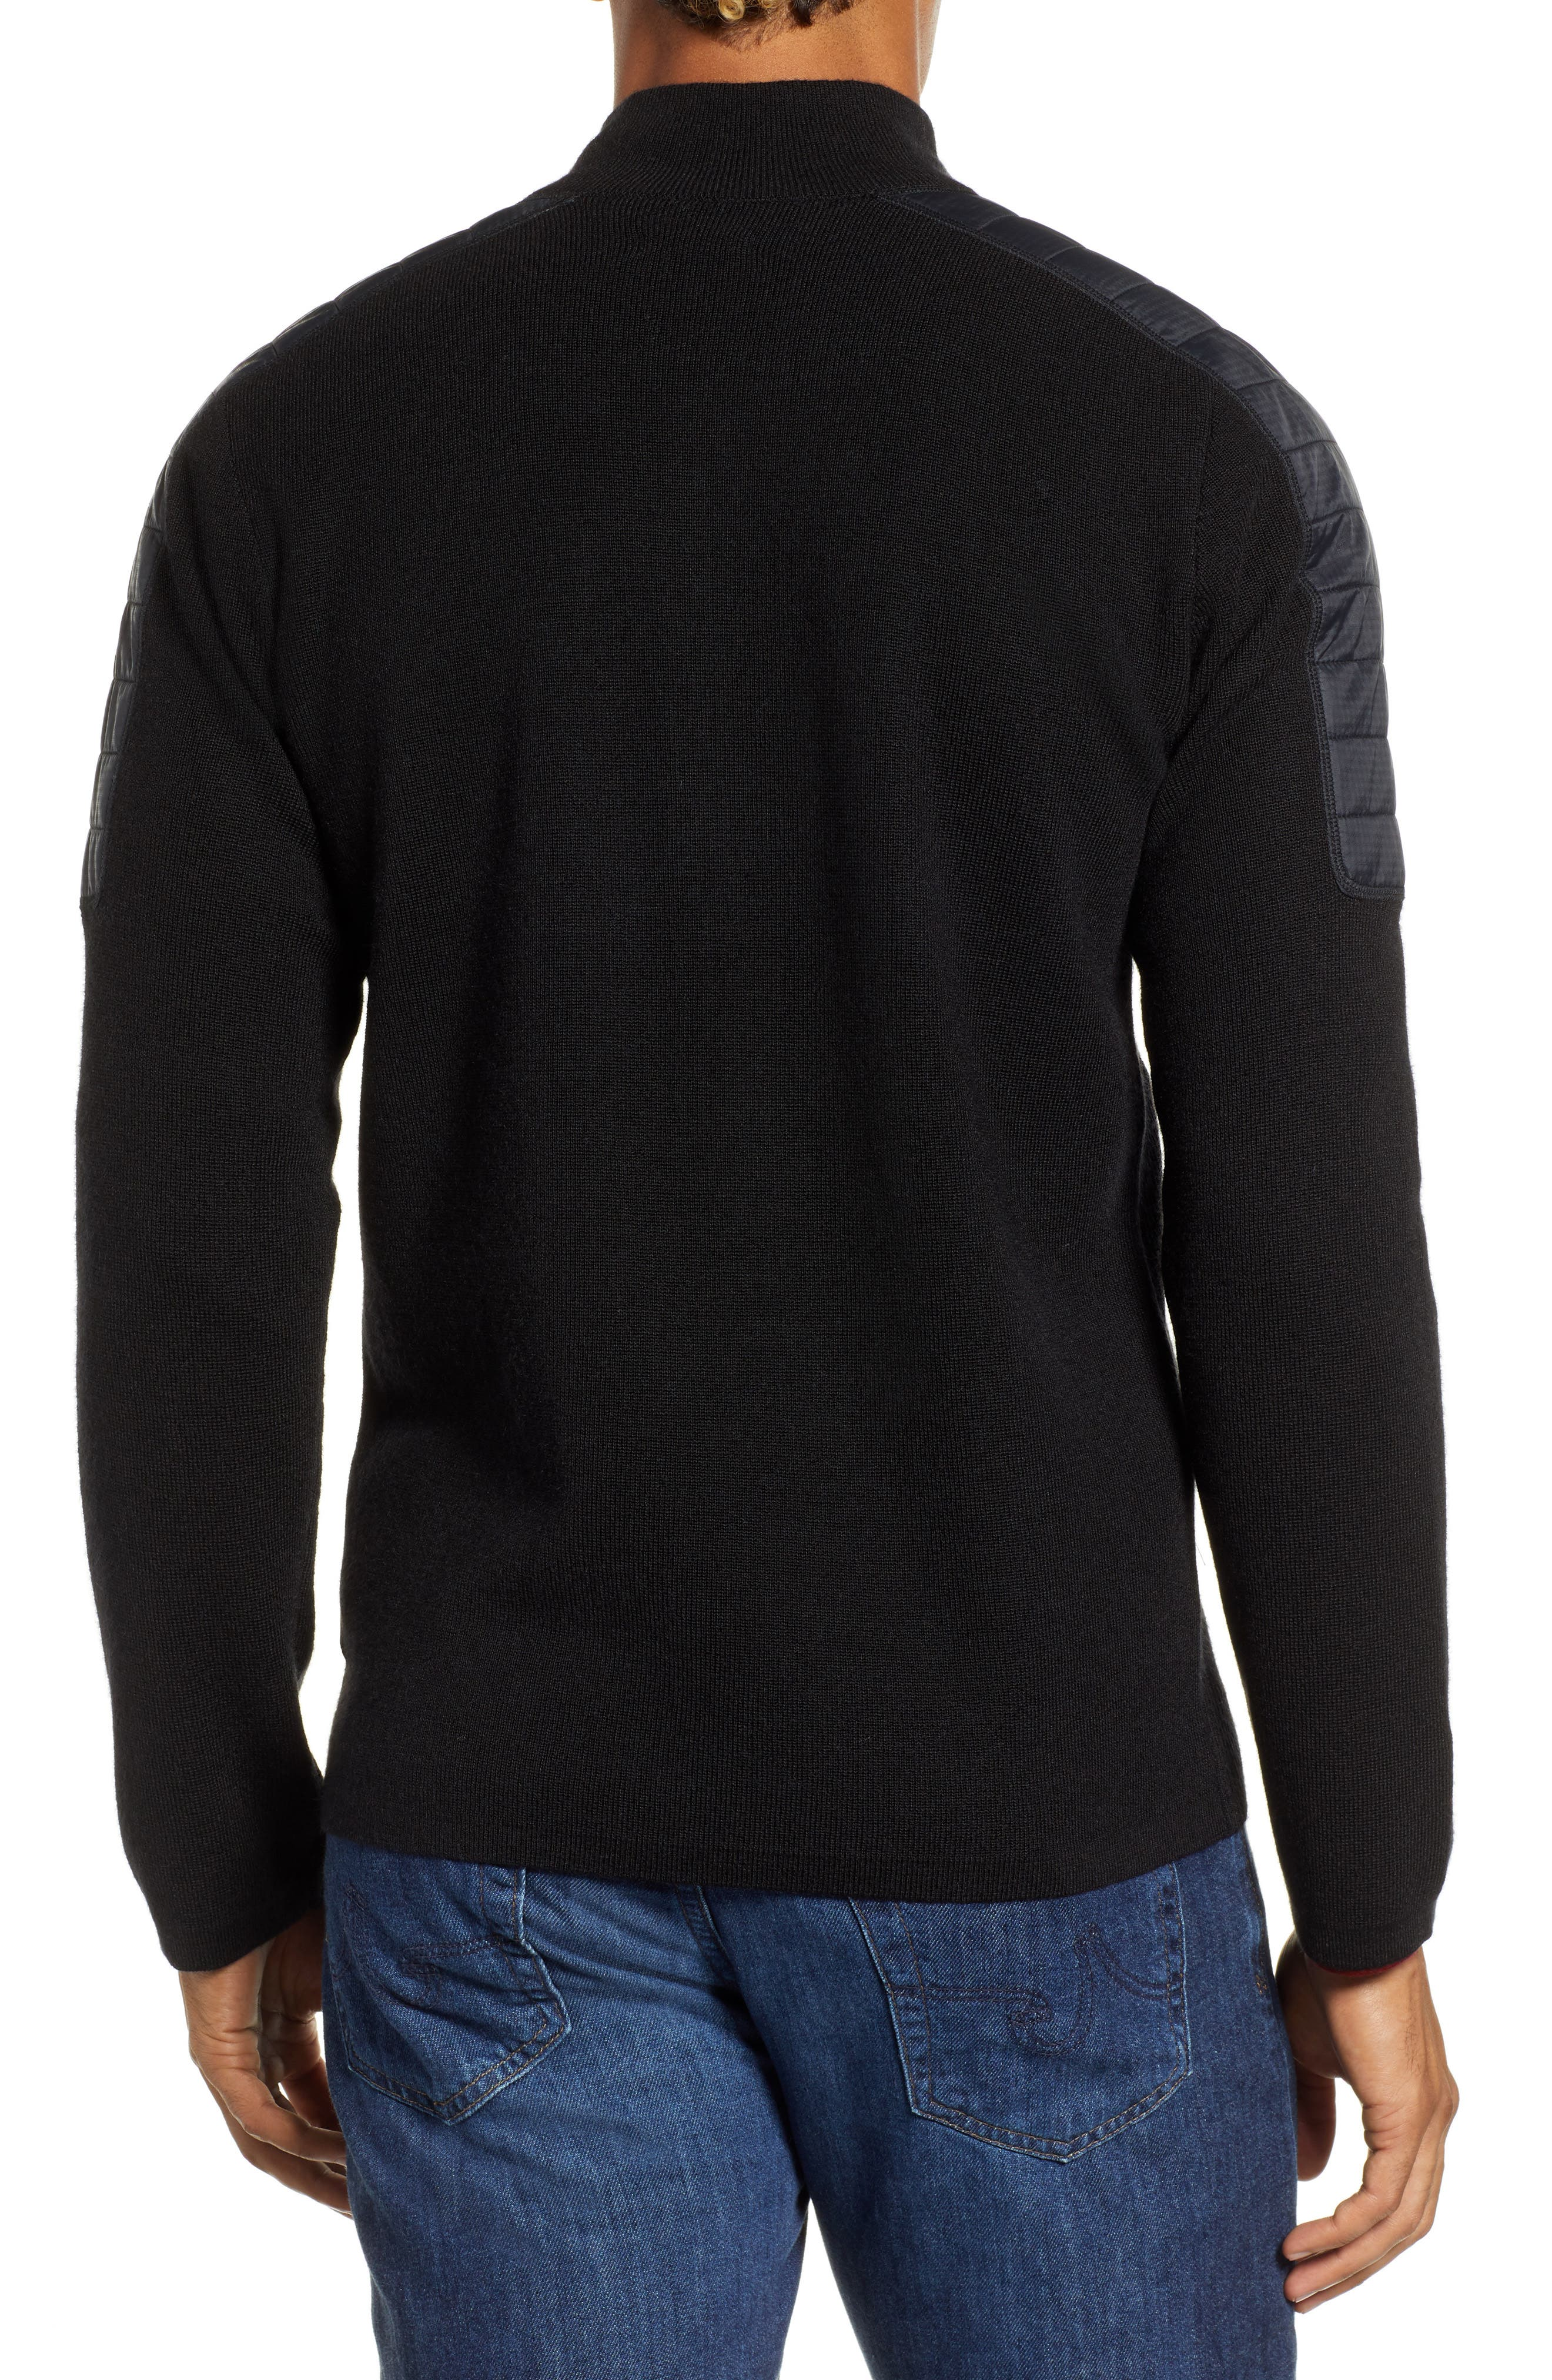 SMARTWOOL,                             Ski Ninja Pullover Sweater,                             Alternate thumbnail 2, color,                             BLACK